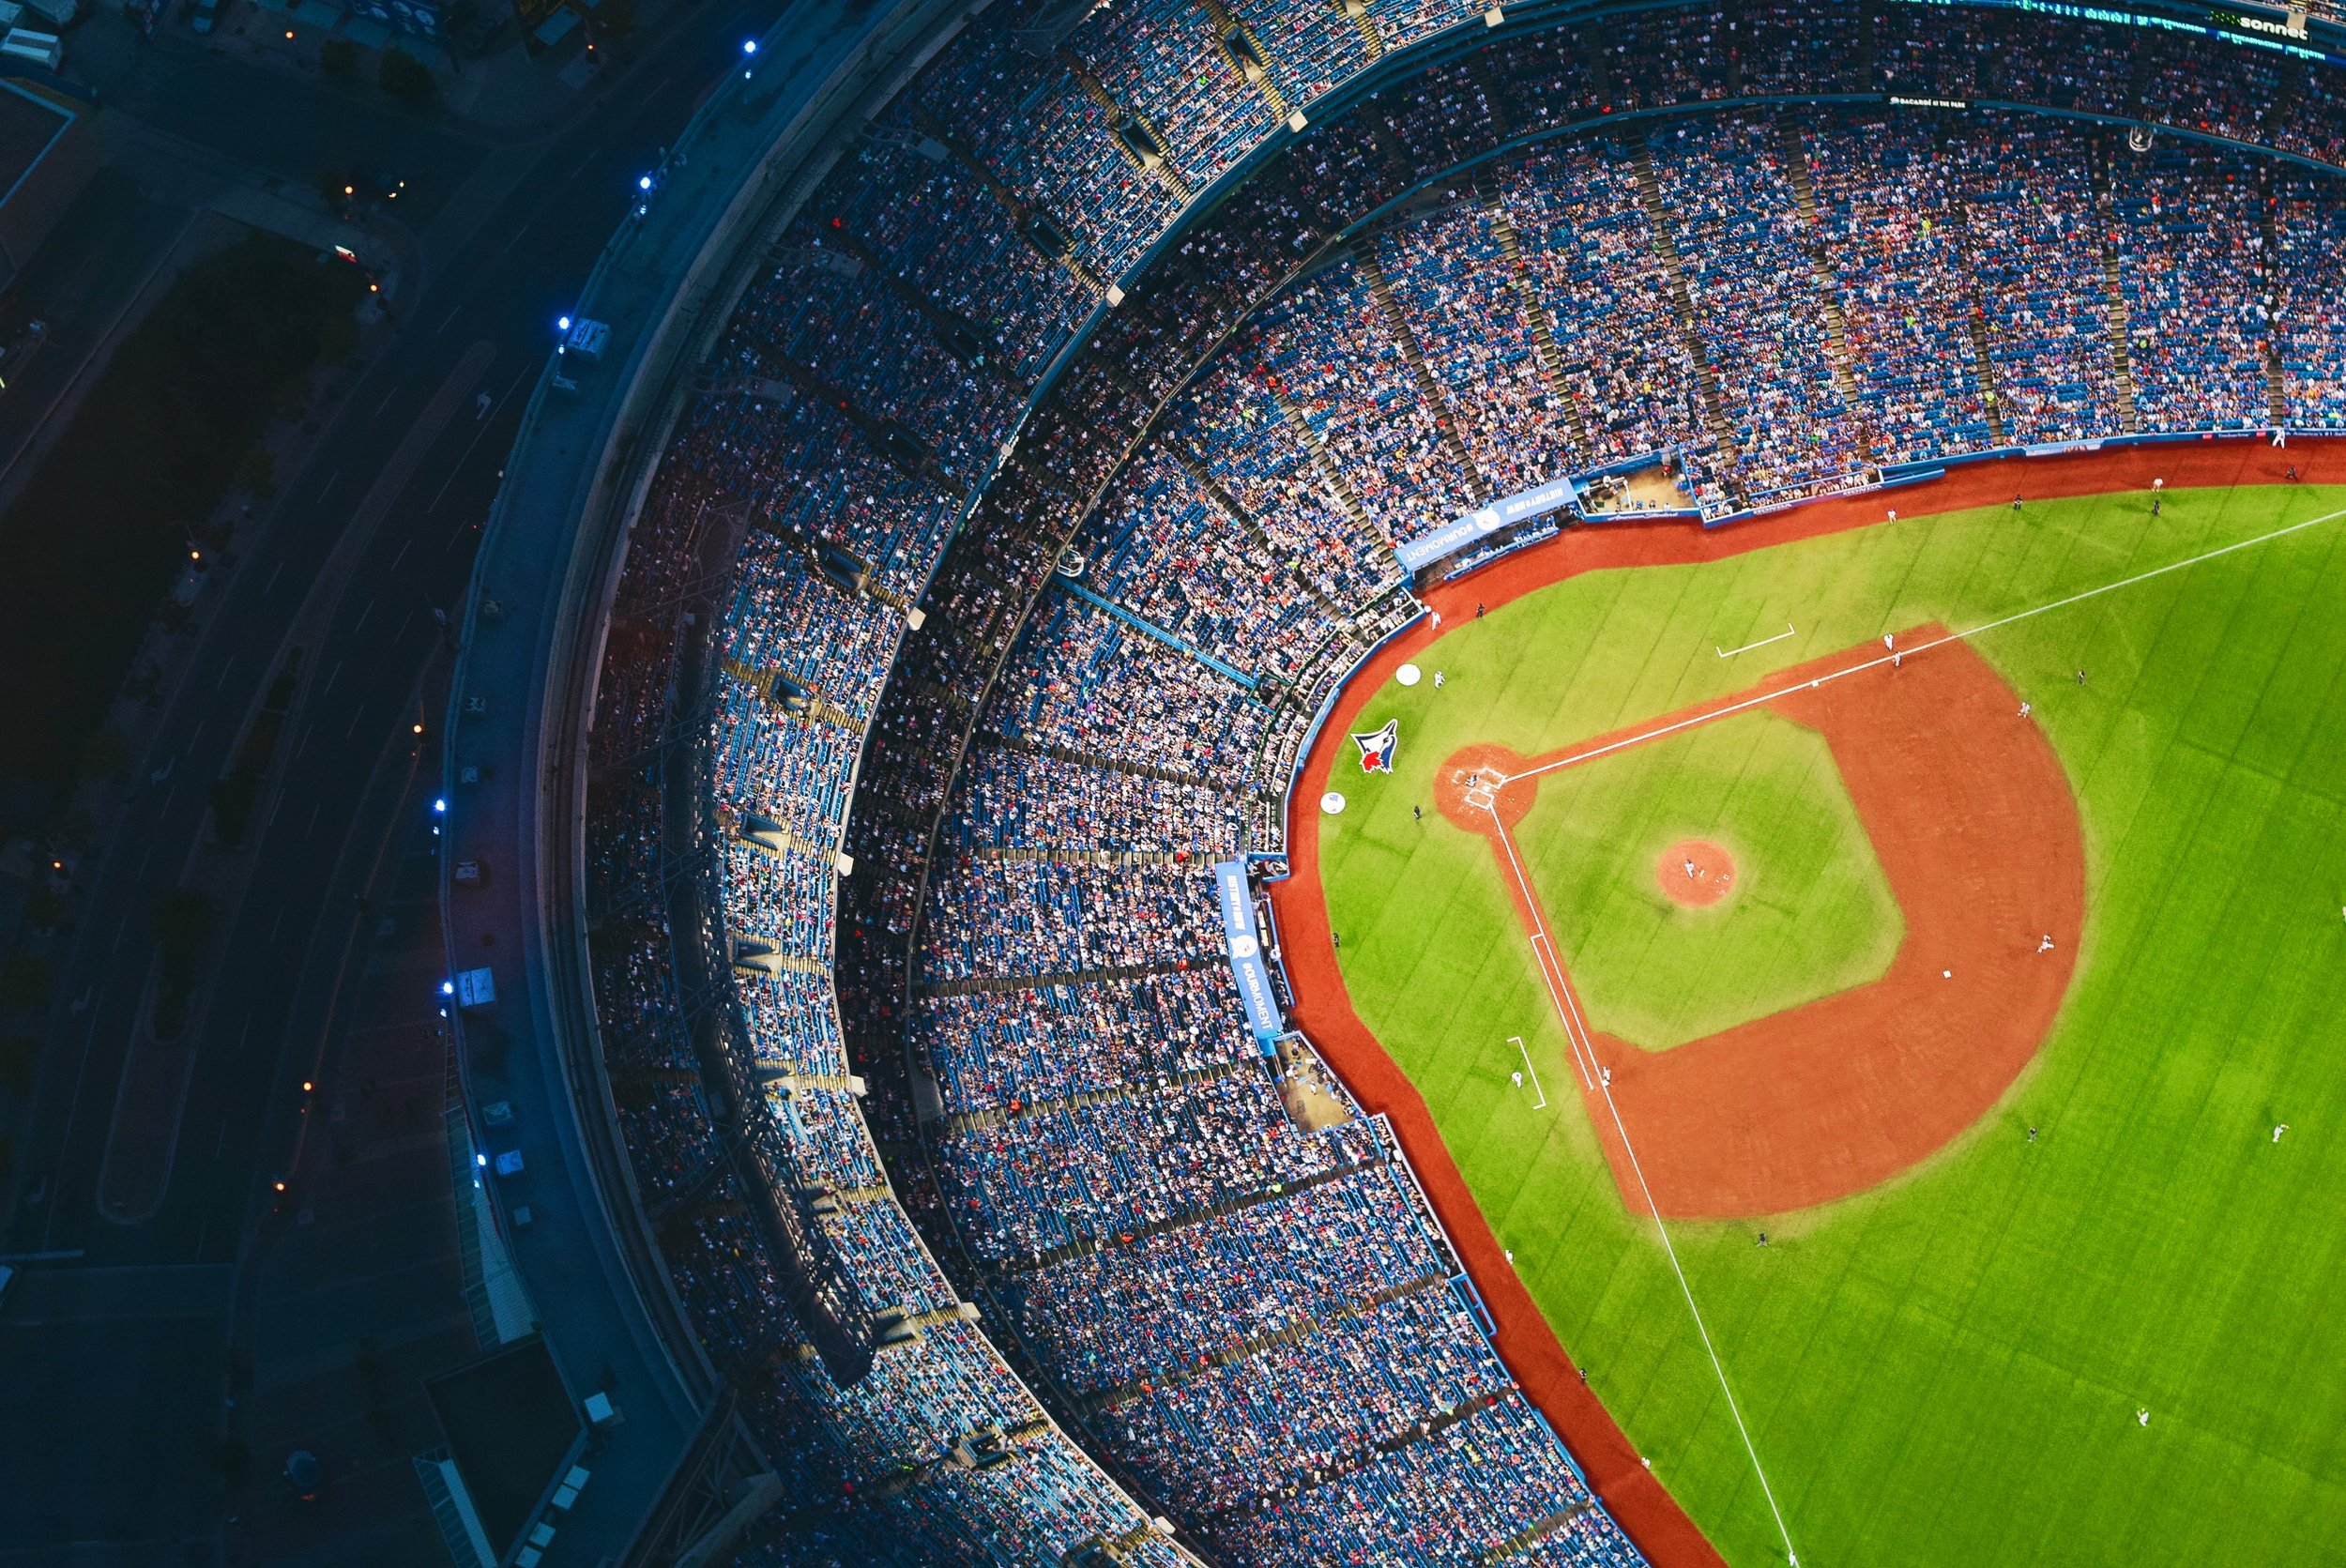 Baseball - The Youth Academy